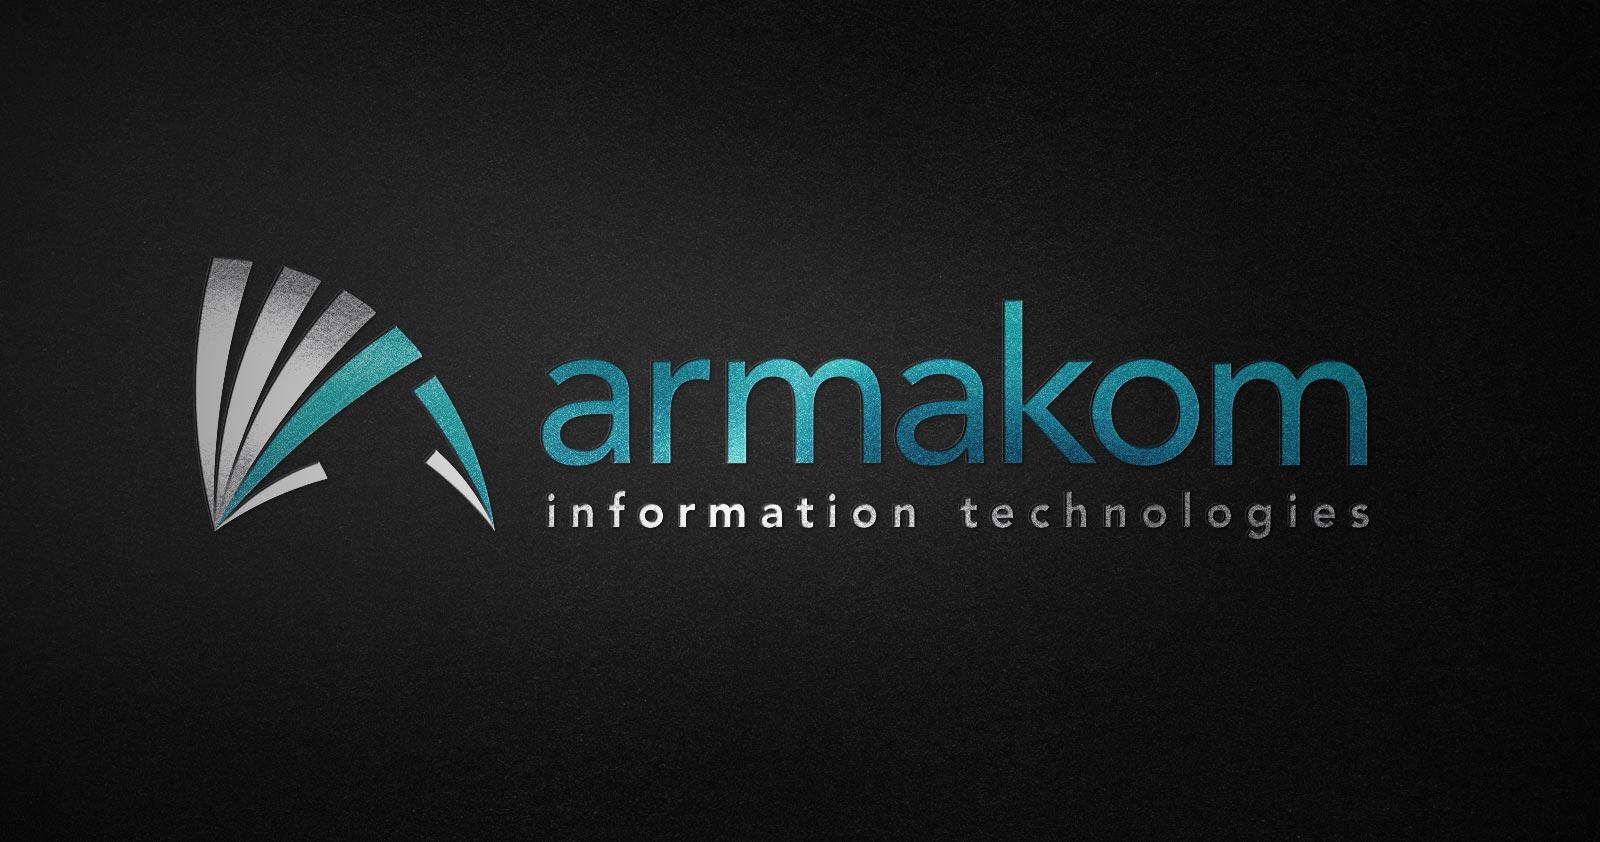 Armakom logo kurumsal kimlik tasarımı 02